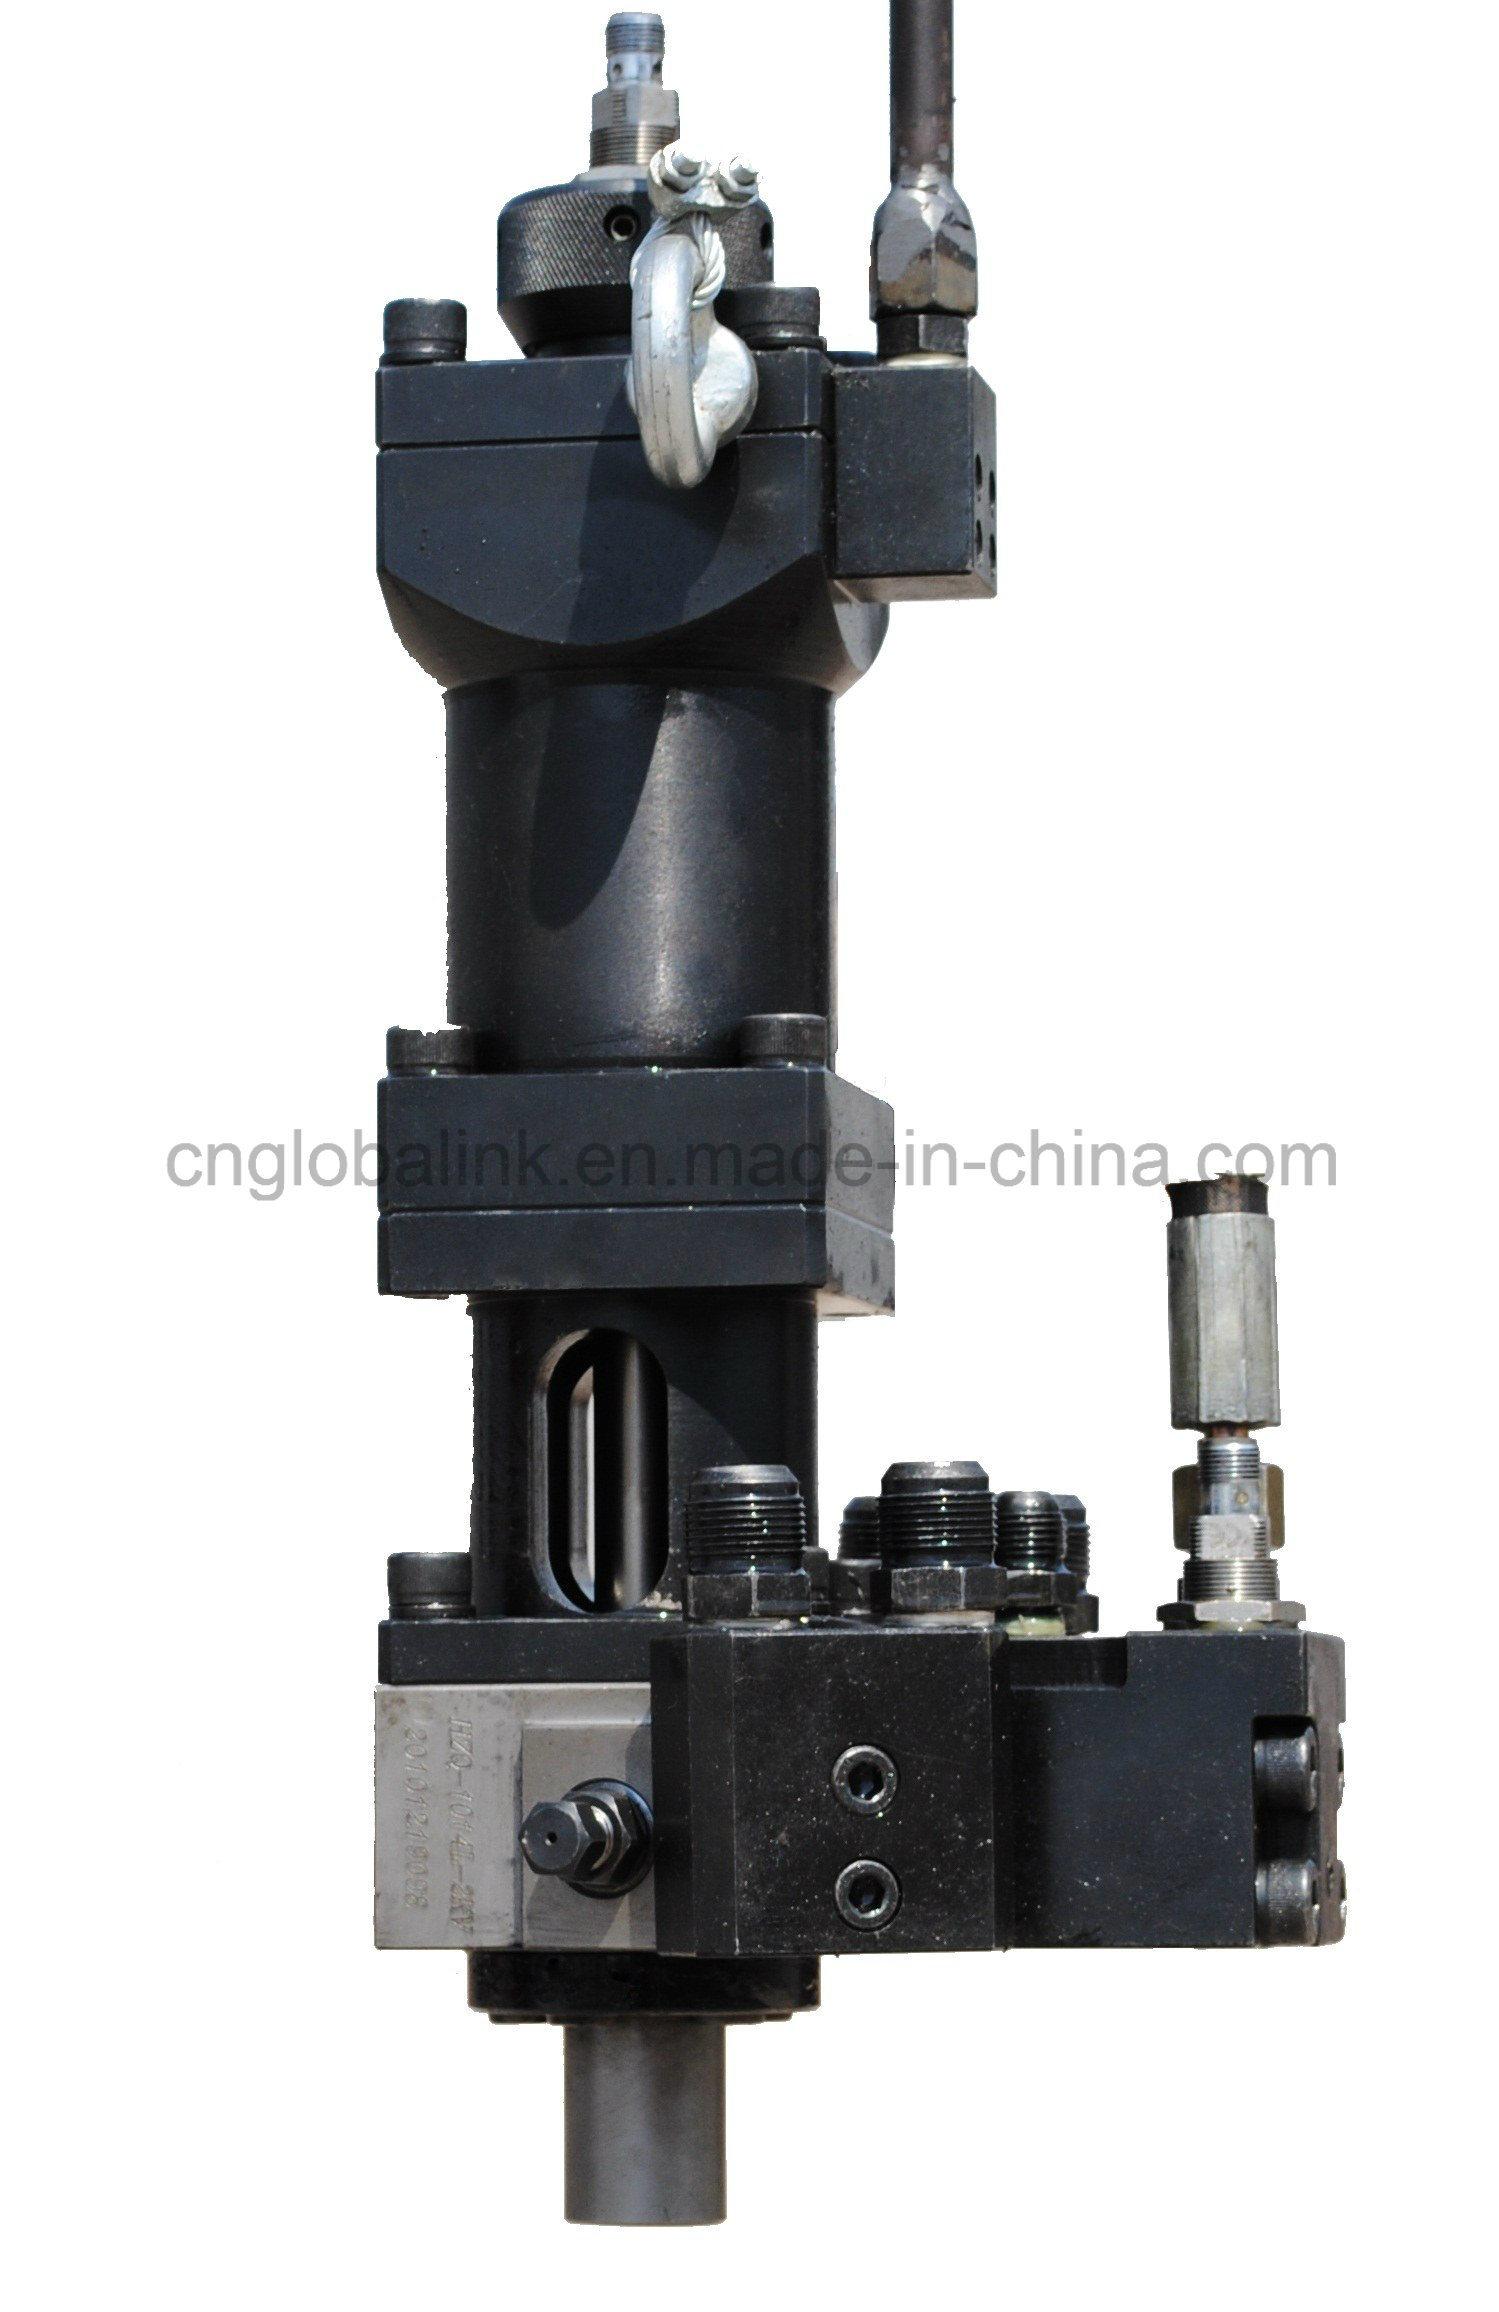 China High Pressure Polyurethane Mix Head, 2 Components, L